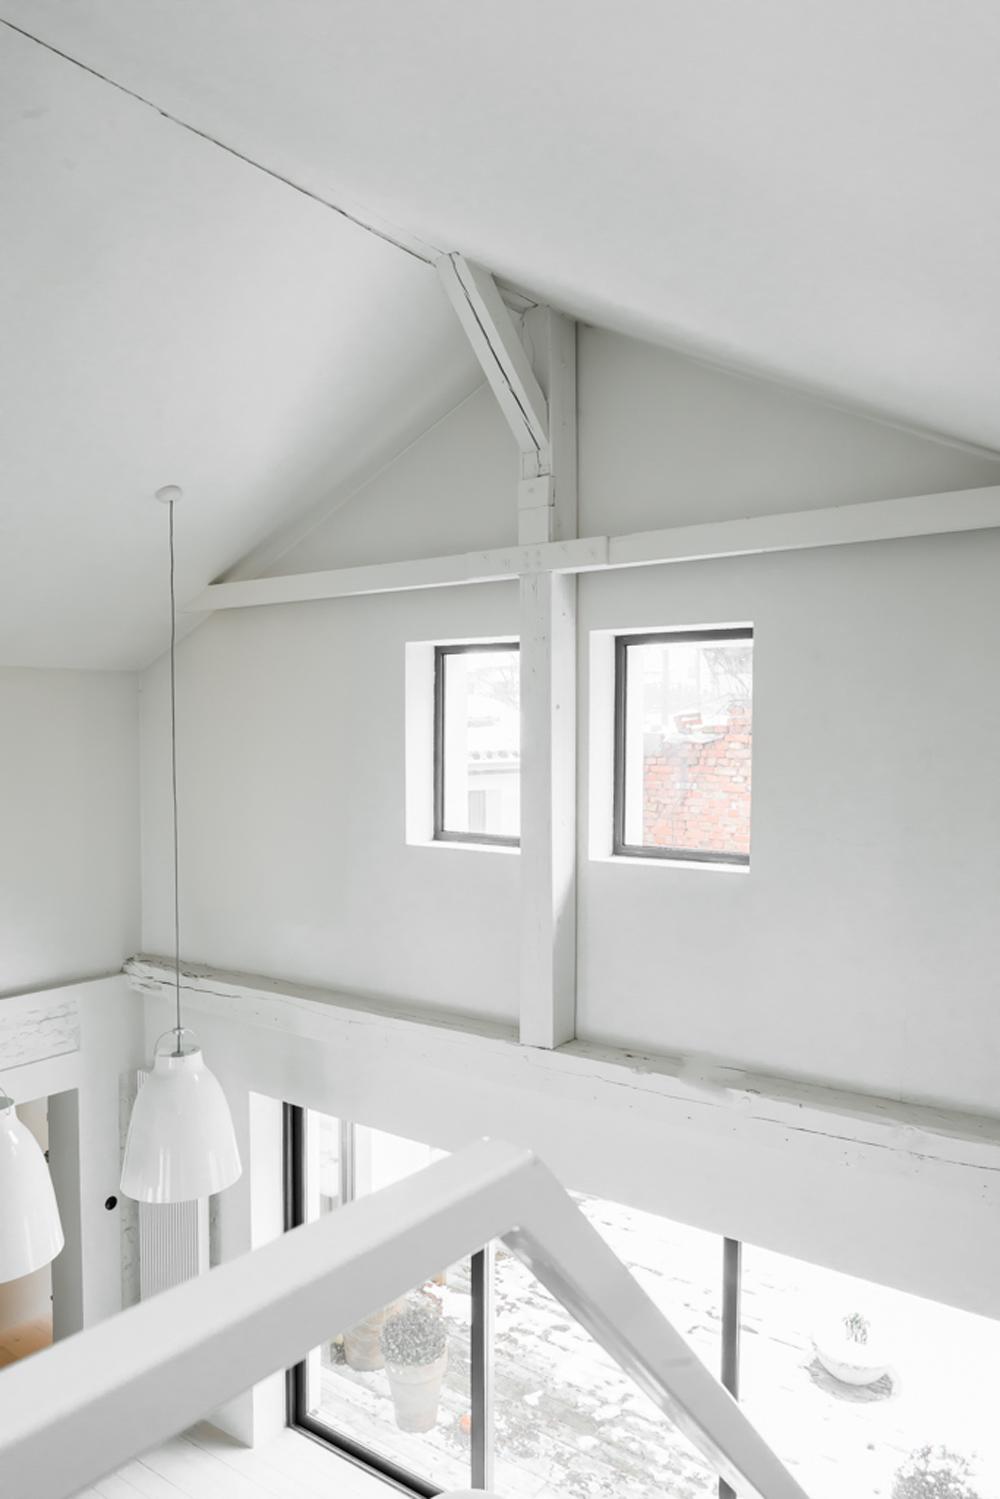 Oracle, Fox, Sunday, Sanctuary, Polish, Farmhouse, White, Minimalist, Interior, Indoor, Plants, Scandinavian, Style, All, White, Interior